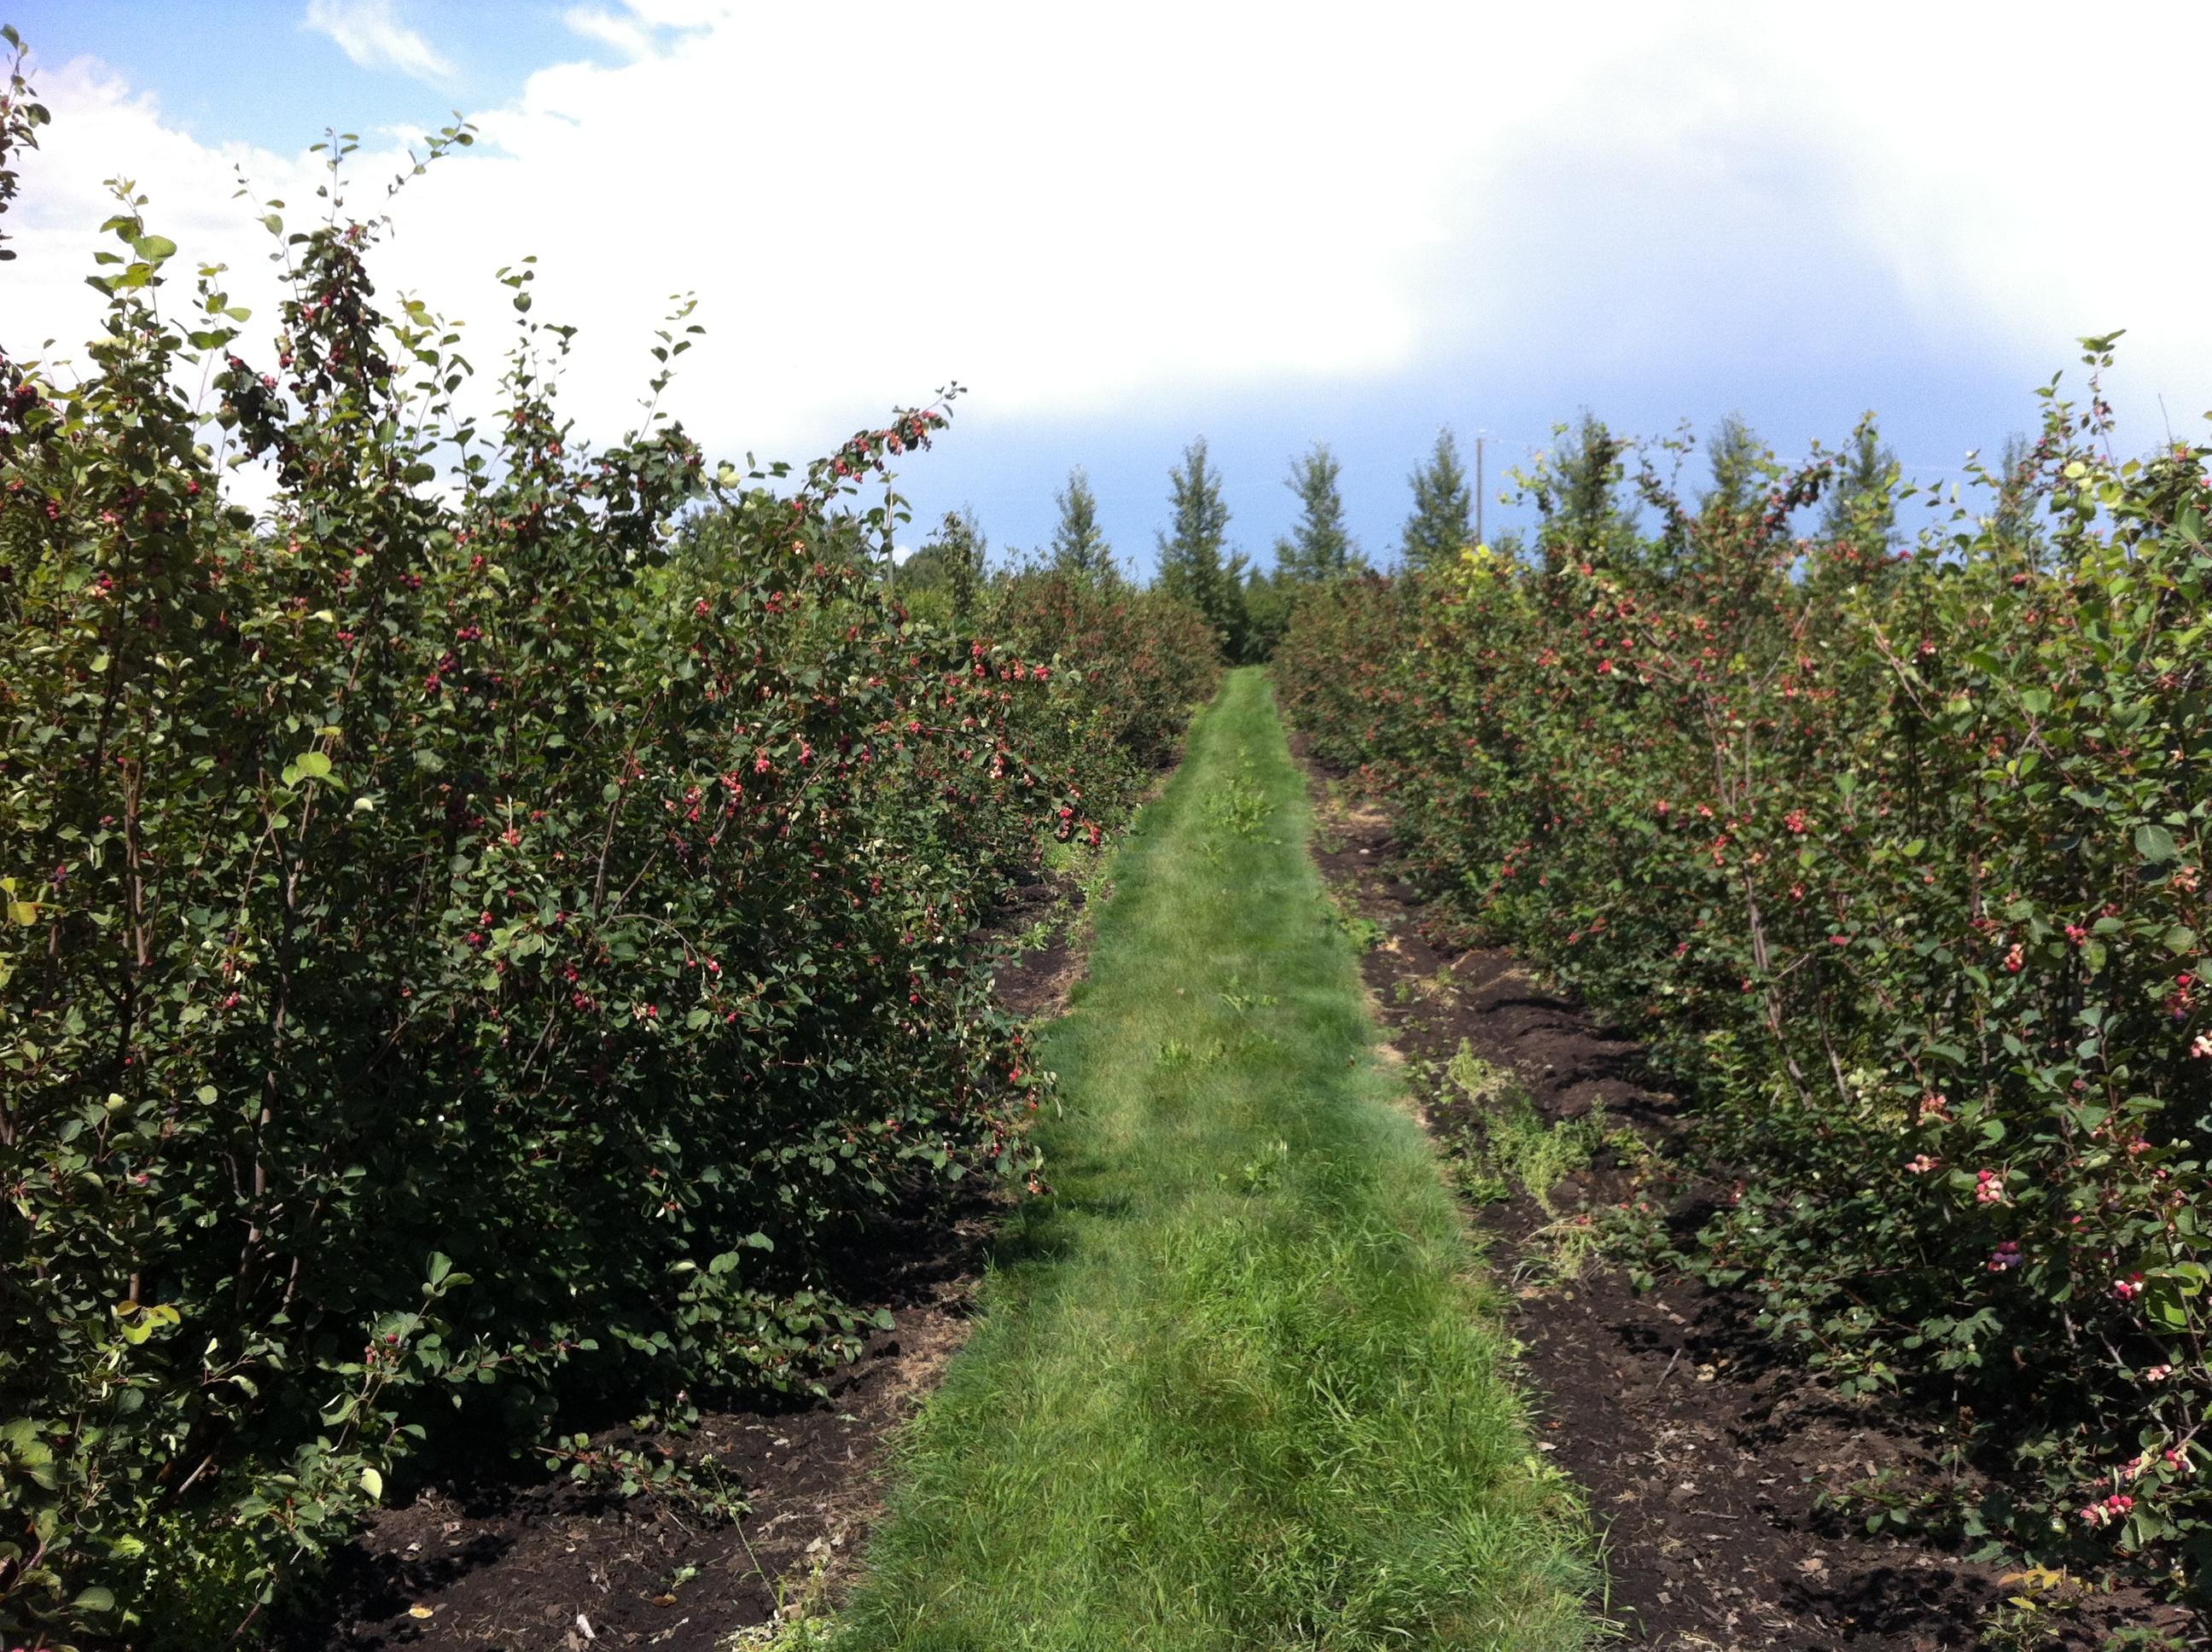 Saskatoon Berry Farm